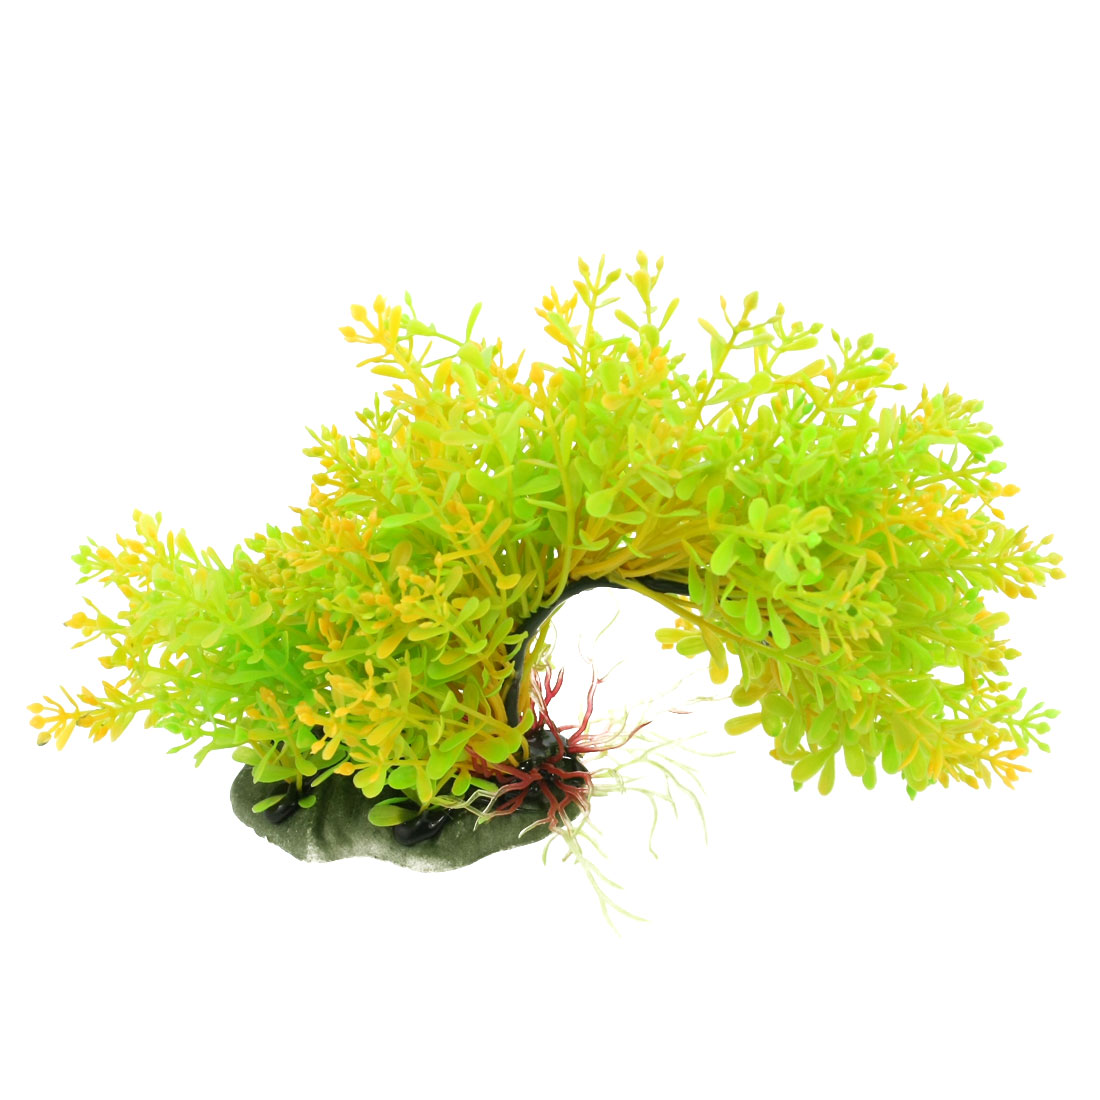 Fish Tank Plastic Arch Bridge Style Aquatic Plants Yellow Green